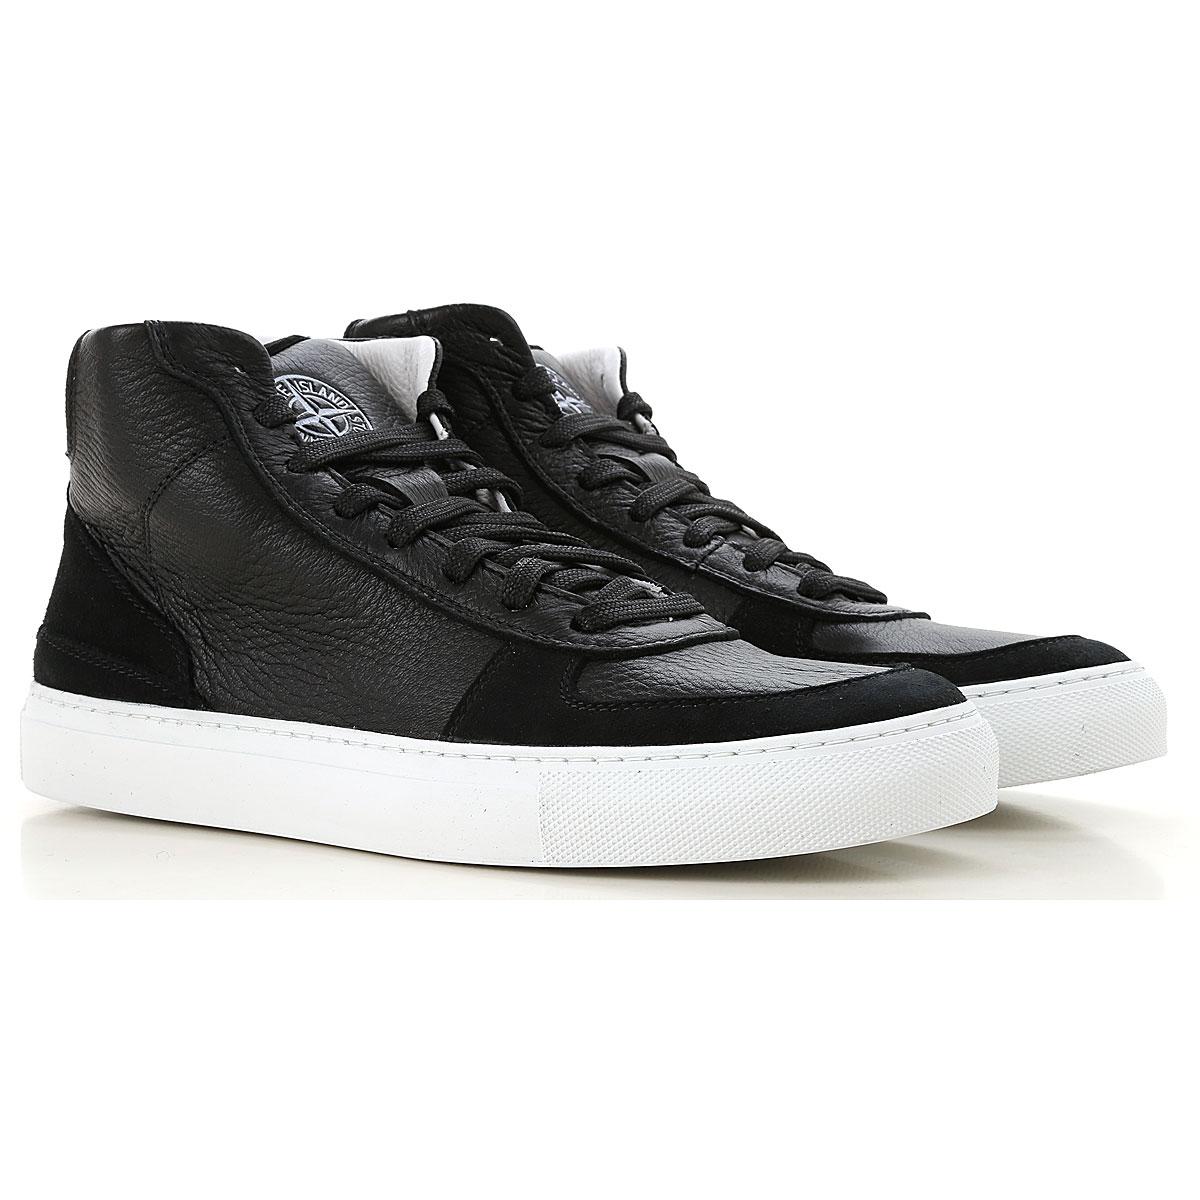 Stone Island Sneaker Homme, Noir, Cuir, 2017, 40 41 42 43 44